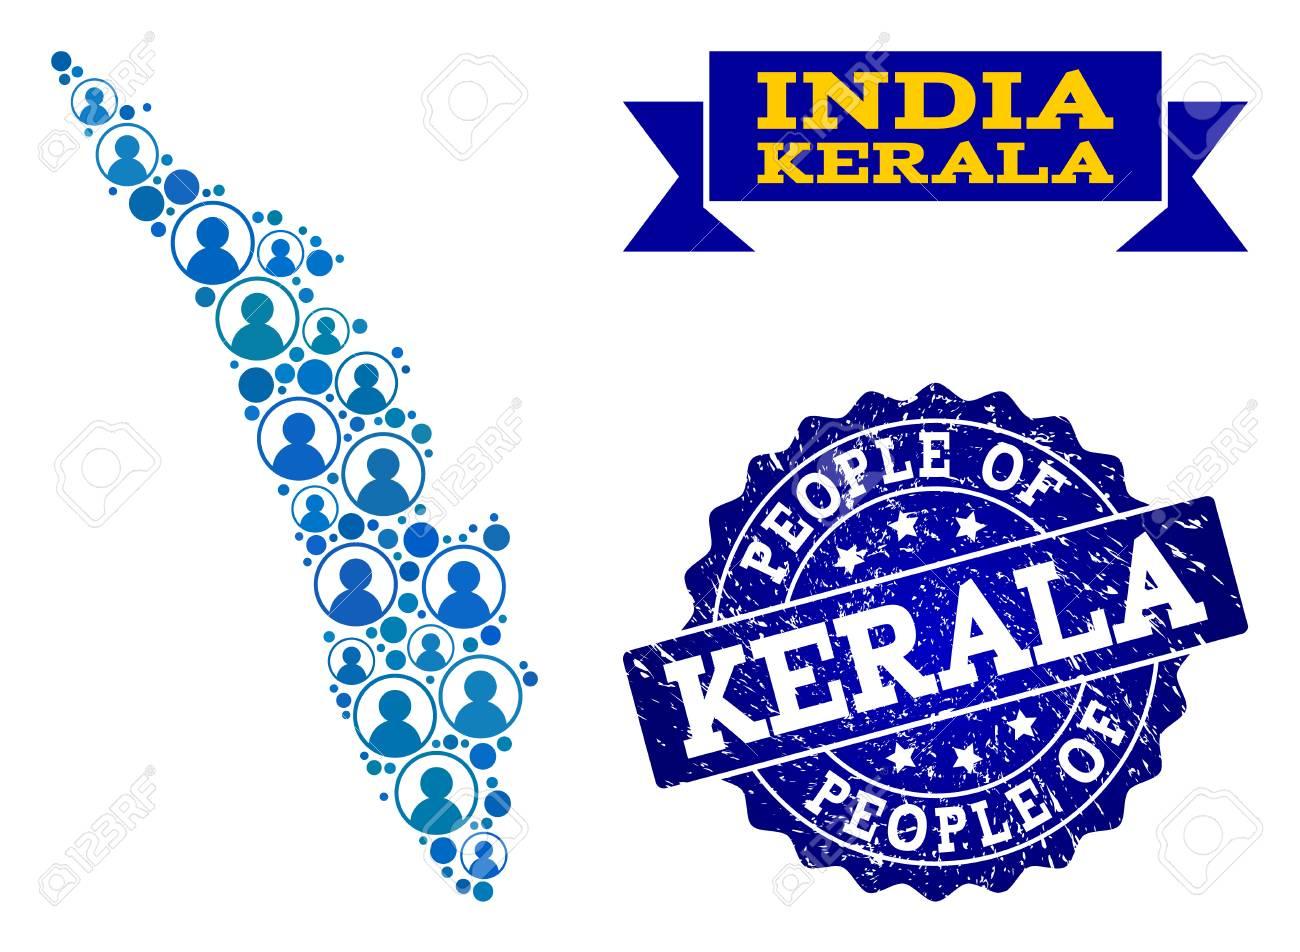 People composition of blue potion map of Kerala State and.. on bahia state map, jaipur state map, states of india, pondicherry map, gwalior state map, karnataka state map, maharashtra state map, andhra pradesh, rajasthan state map, telangana state map, himachal pradesh, hyderabad state map, california state map, andhra state map, uttaranchal state map, tamil nadu, minas gerais state map, mp state map, uttar pradesh, the western ghats map, bengal state map, jammu and kashmir, salem state map, ebonyi state map, borno state map, osun state map,